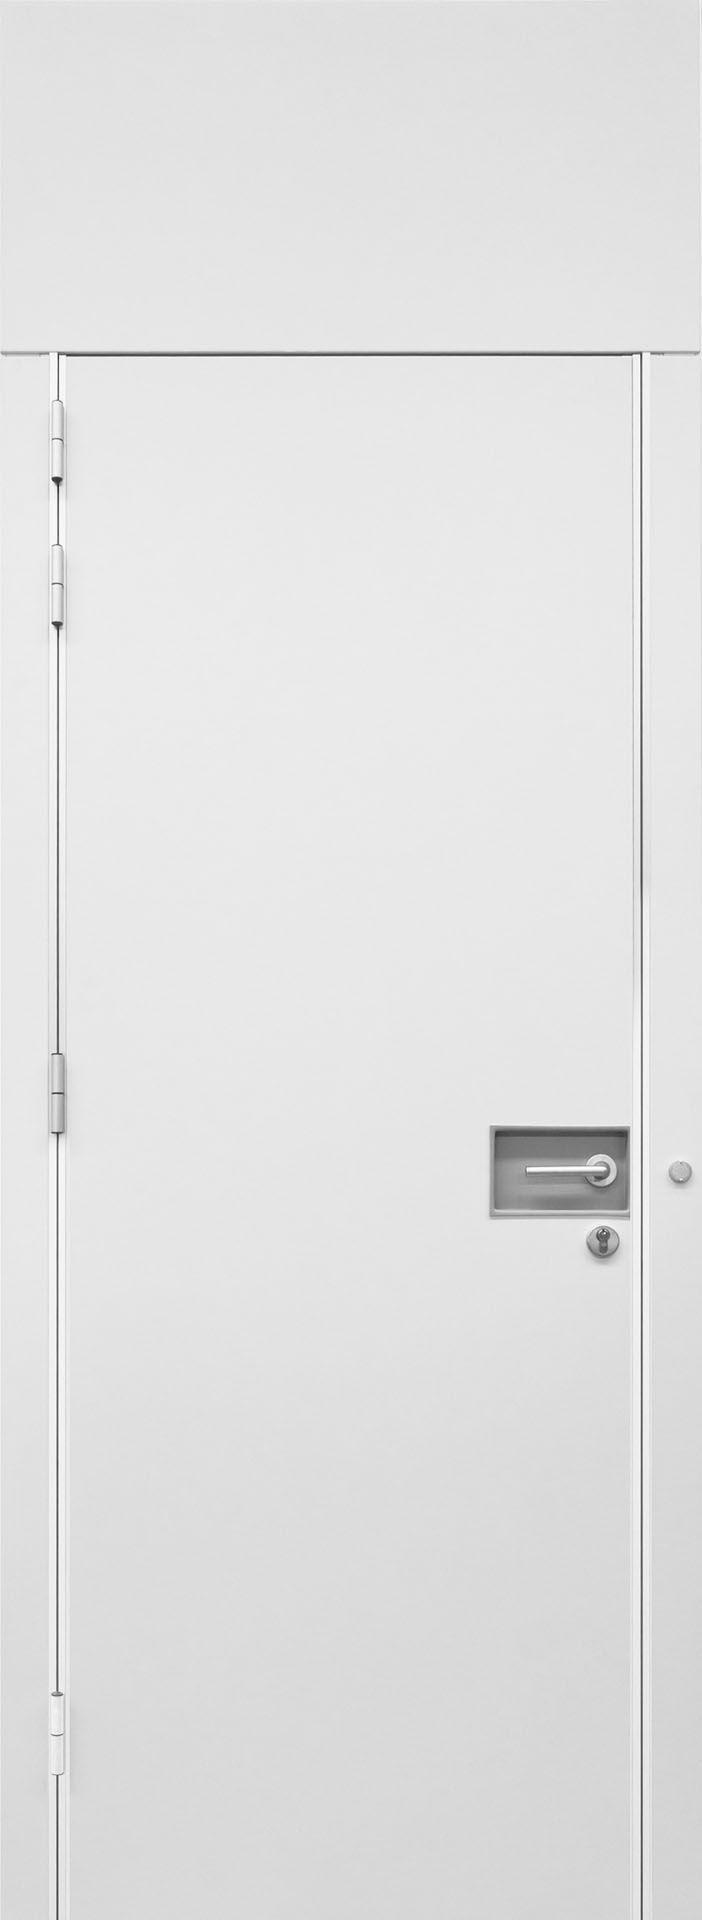 Rolling Wall door in melaminic panels in White color with recessed handle  //  ---  //   Porta Rolling Wall in pannelli di melaminico colore bianco con maniglia incassata